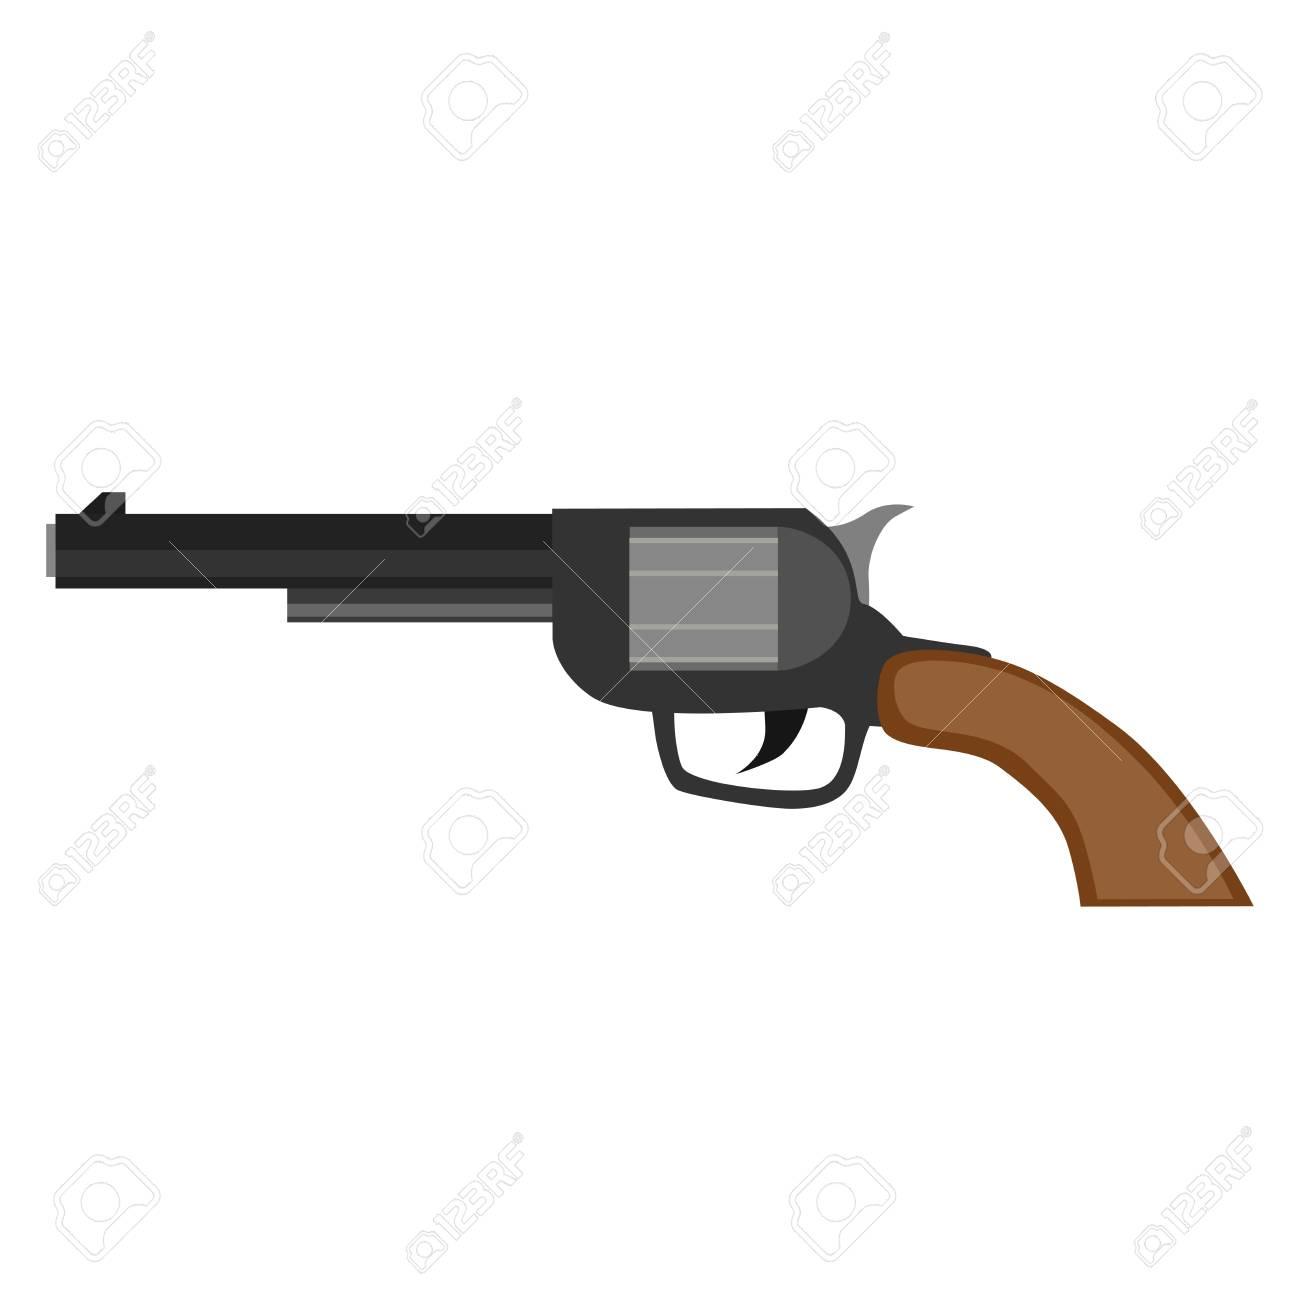 revolver gun pistol vector vintage handgun weapon illustration